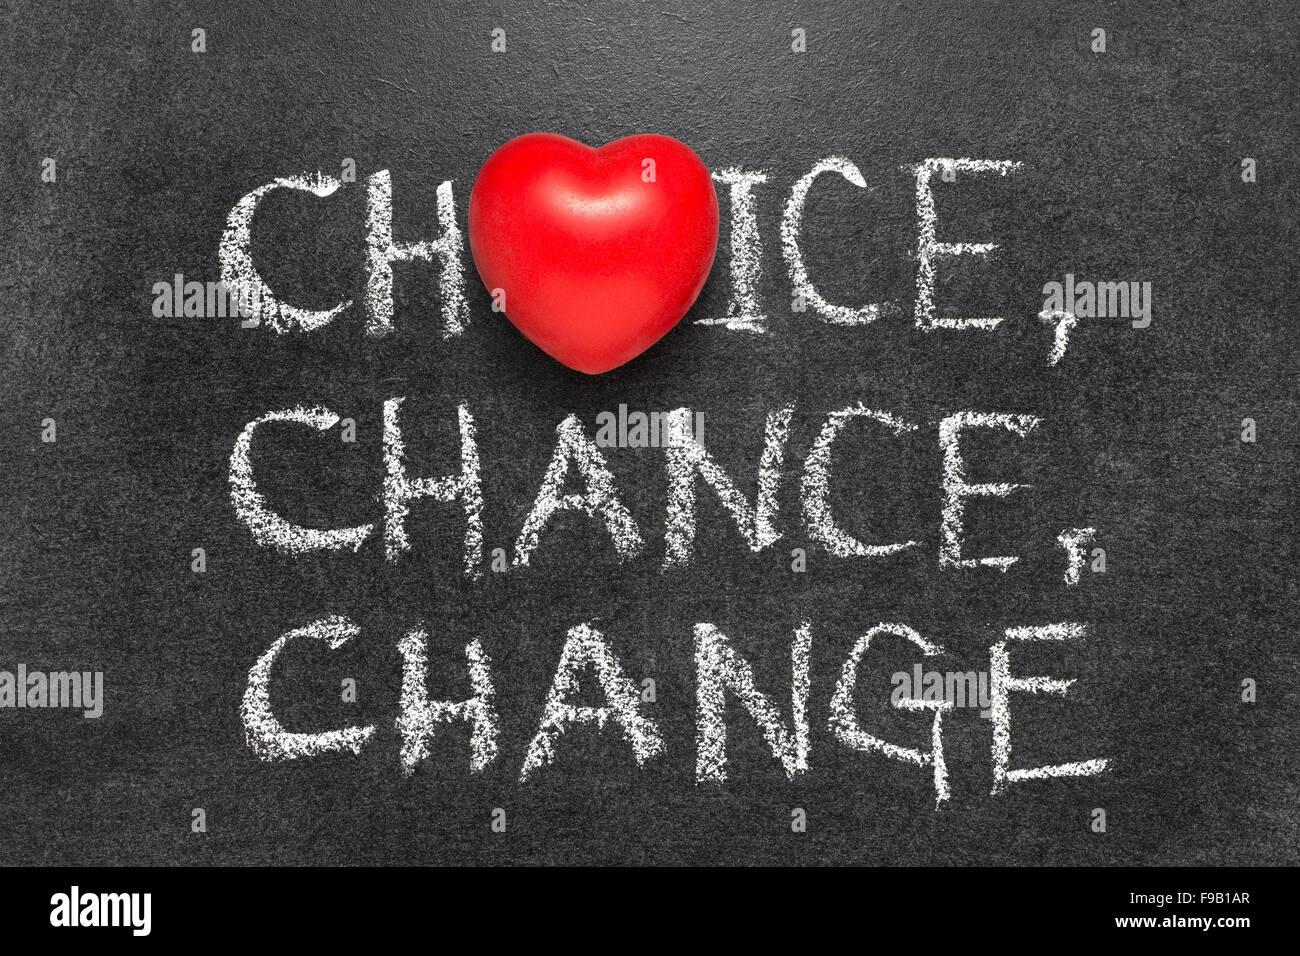 Choice chance change words handwritten on blackboard with heart choice chance change words handwritten on blackboard with heart symbol instead o biocorpaavc